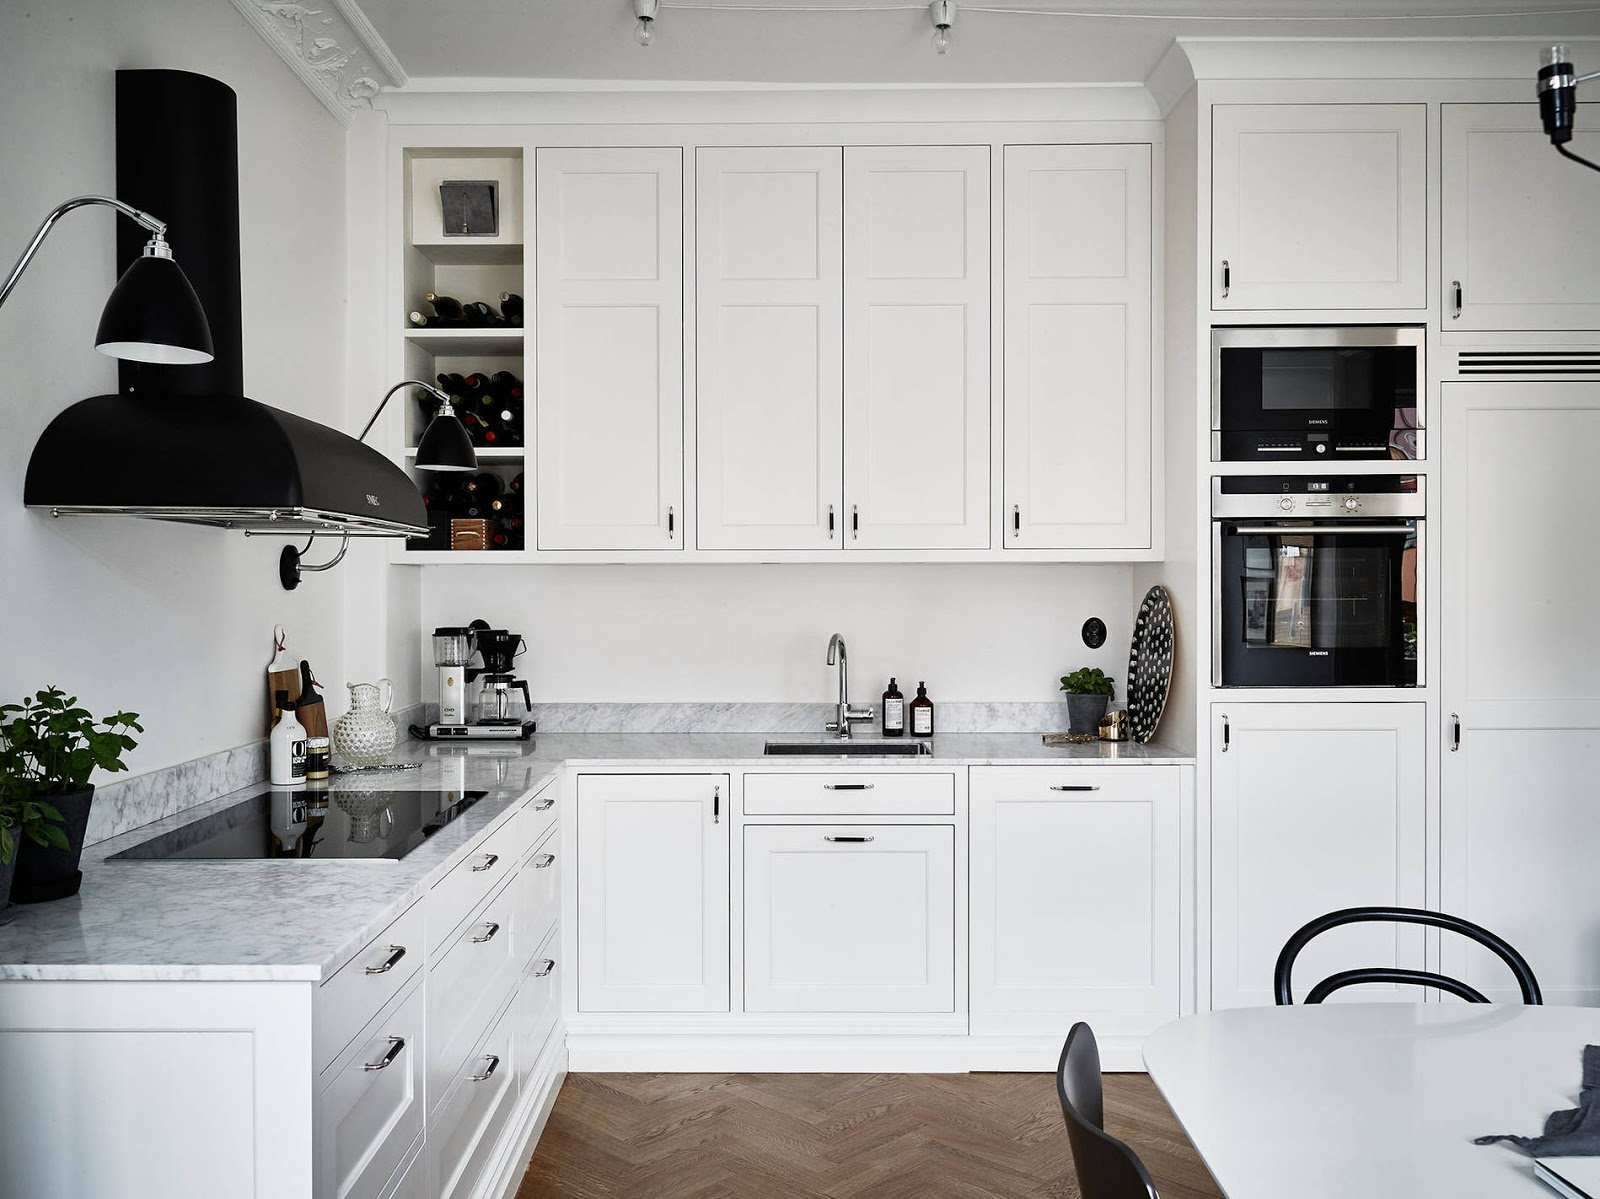 Alti soffitti e cucina classica per questo appartamento a - Cucina classica bianca ...